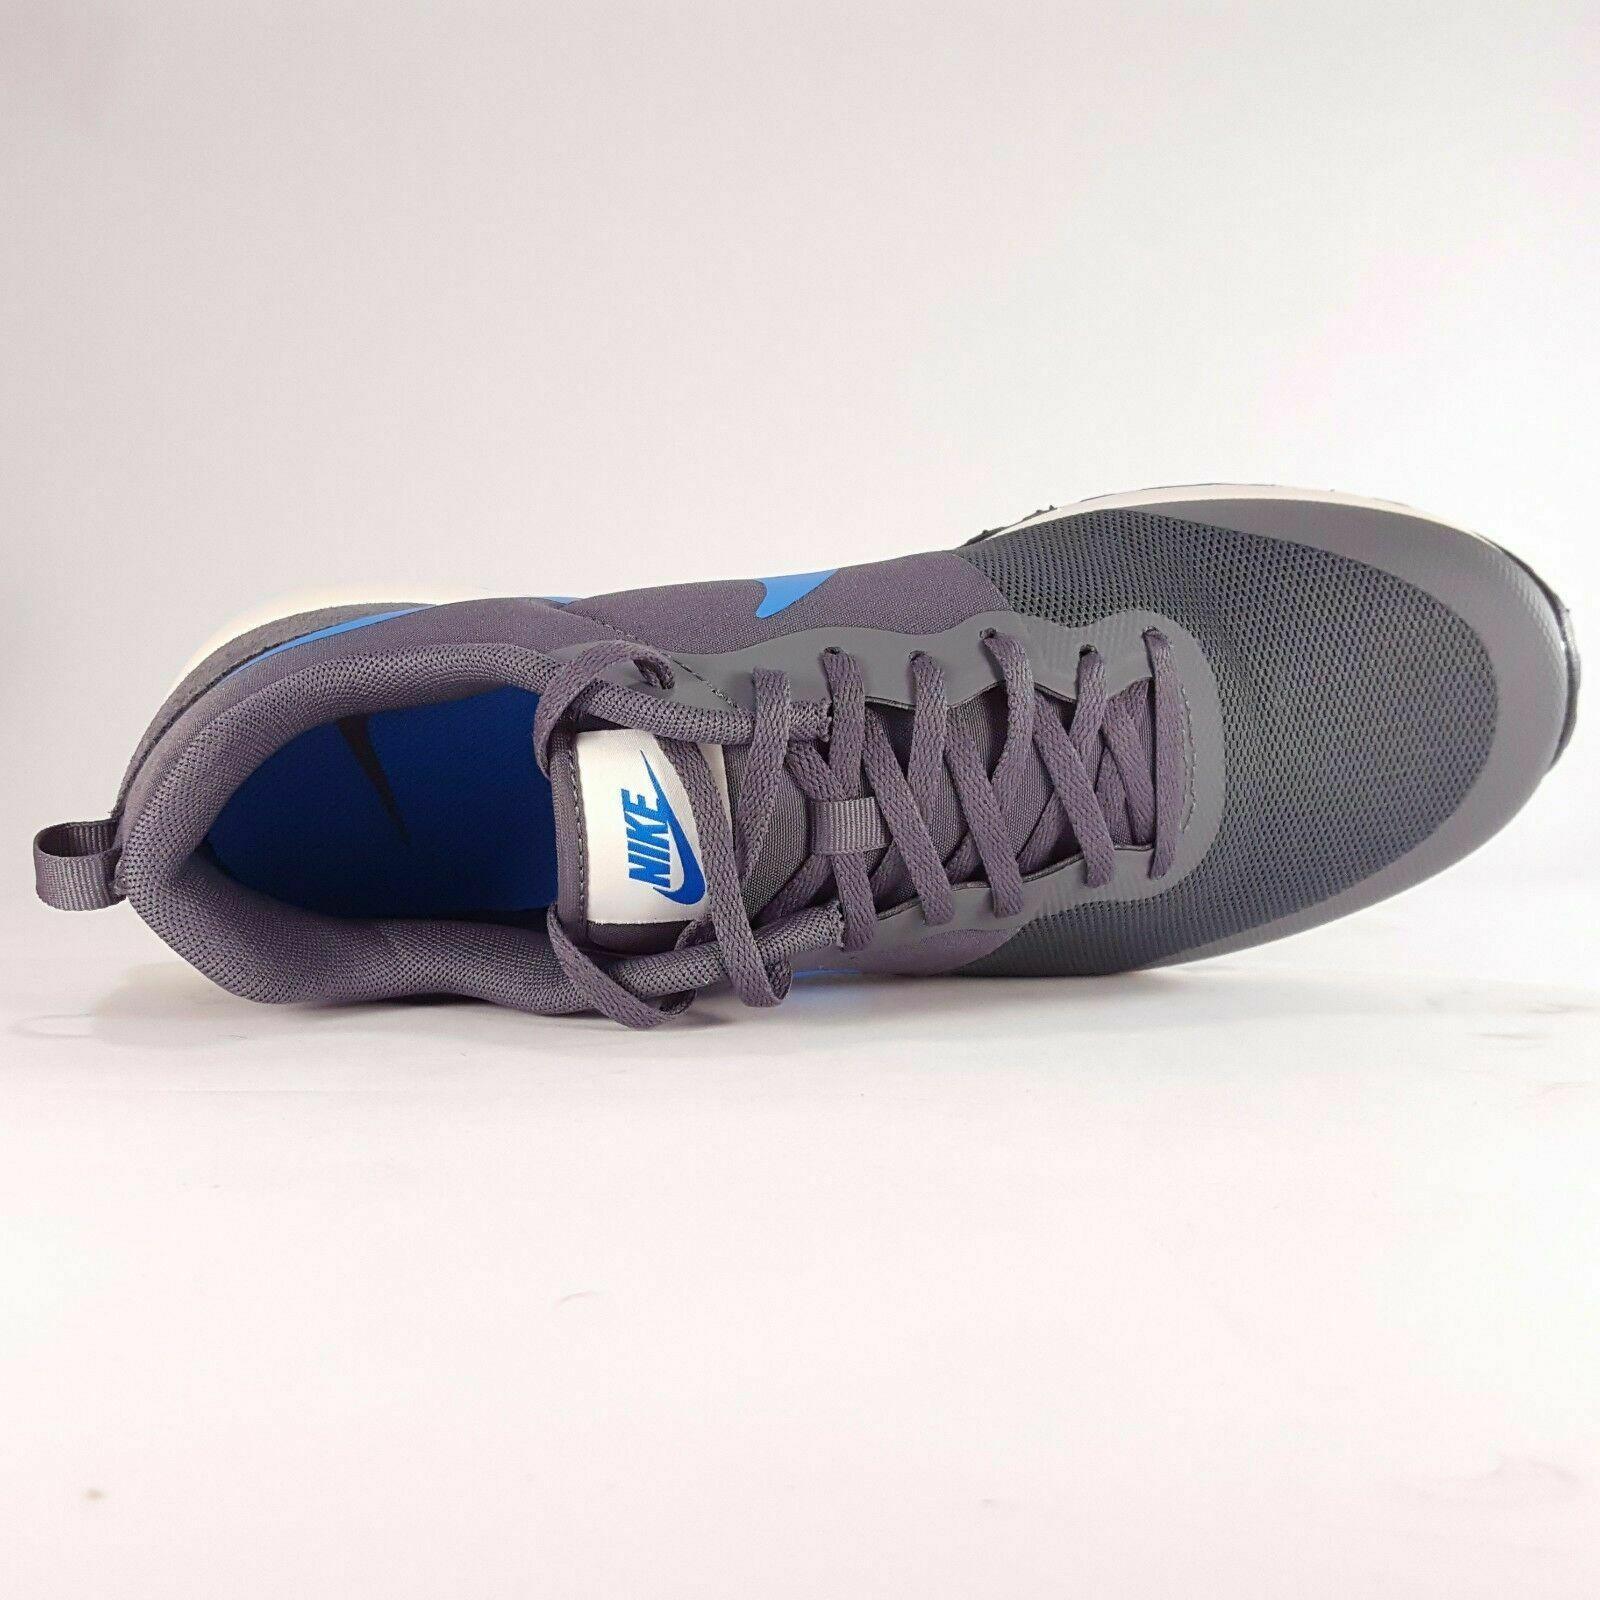 Nike Men's Elite Shinsen Casua Shoes 801780-041 Grey/Blue/White Sneakers Size 10